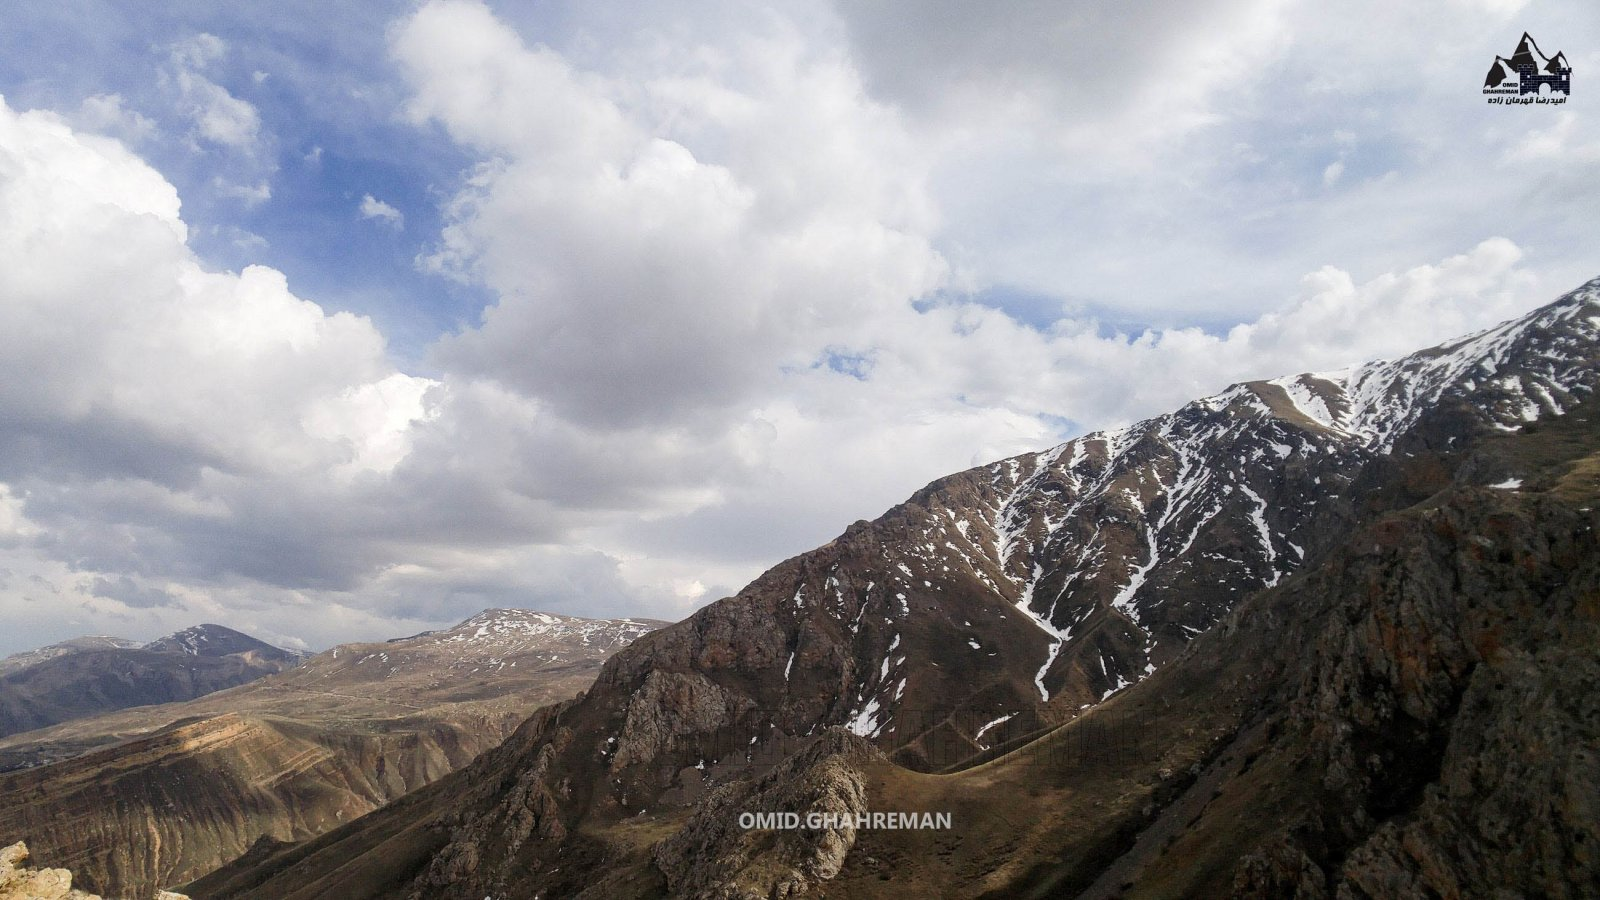 ابتدای مسیر کوه چیرچین ماکو